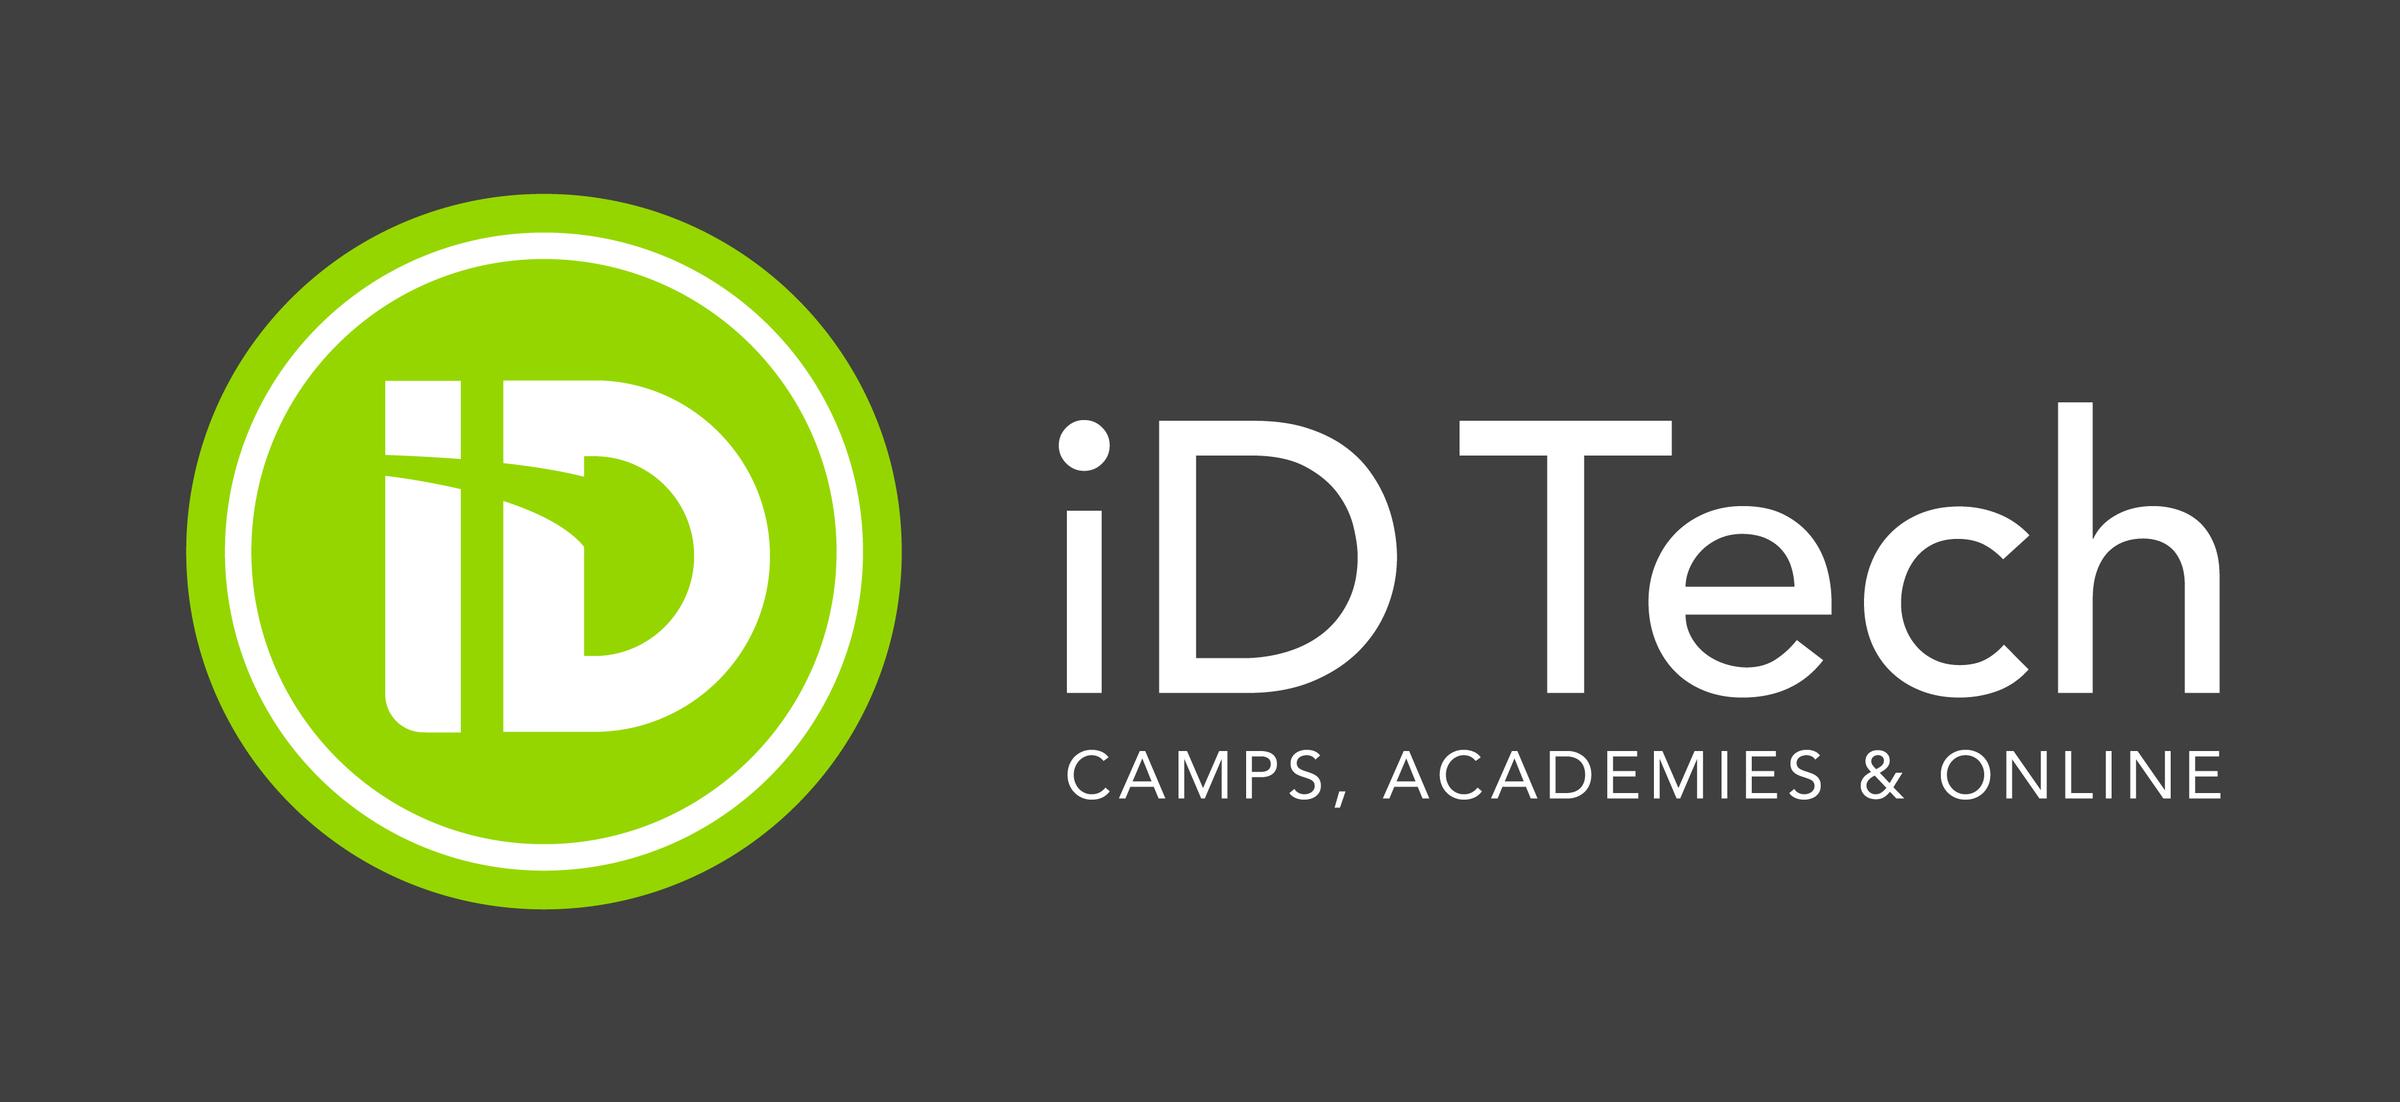 iD Tech Camps: #1 in STEM Education - Held at Villanova University